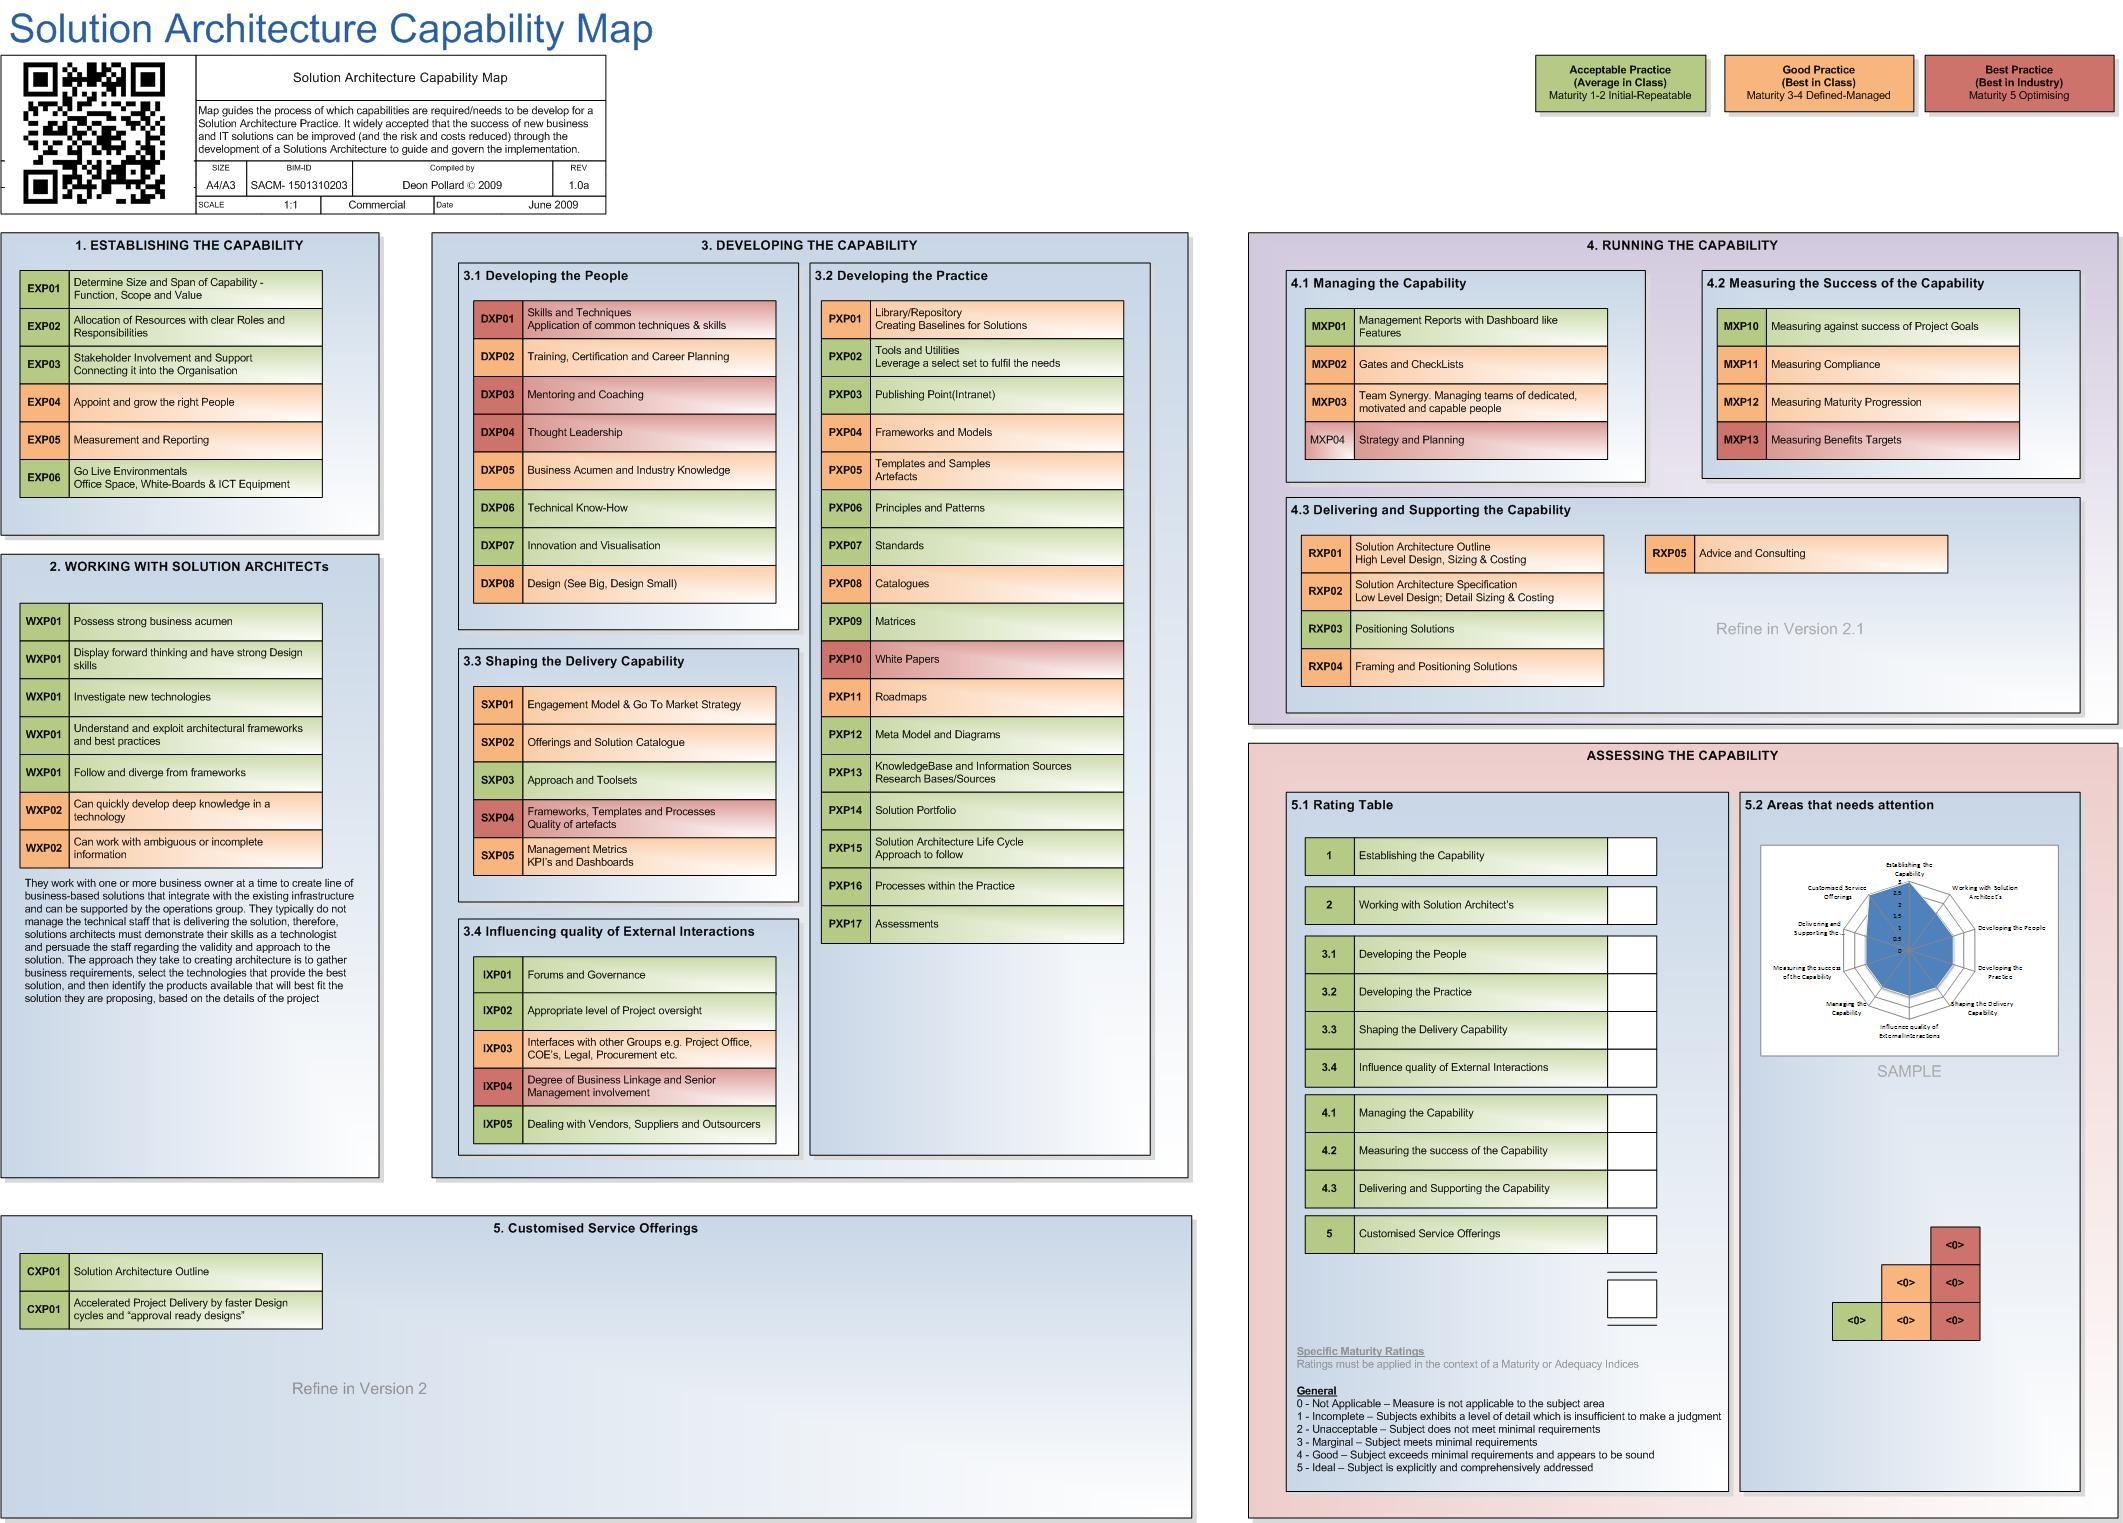 Solution Architecture Capability Map Enterprise Architecture